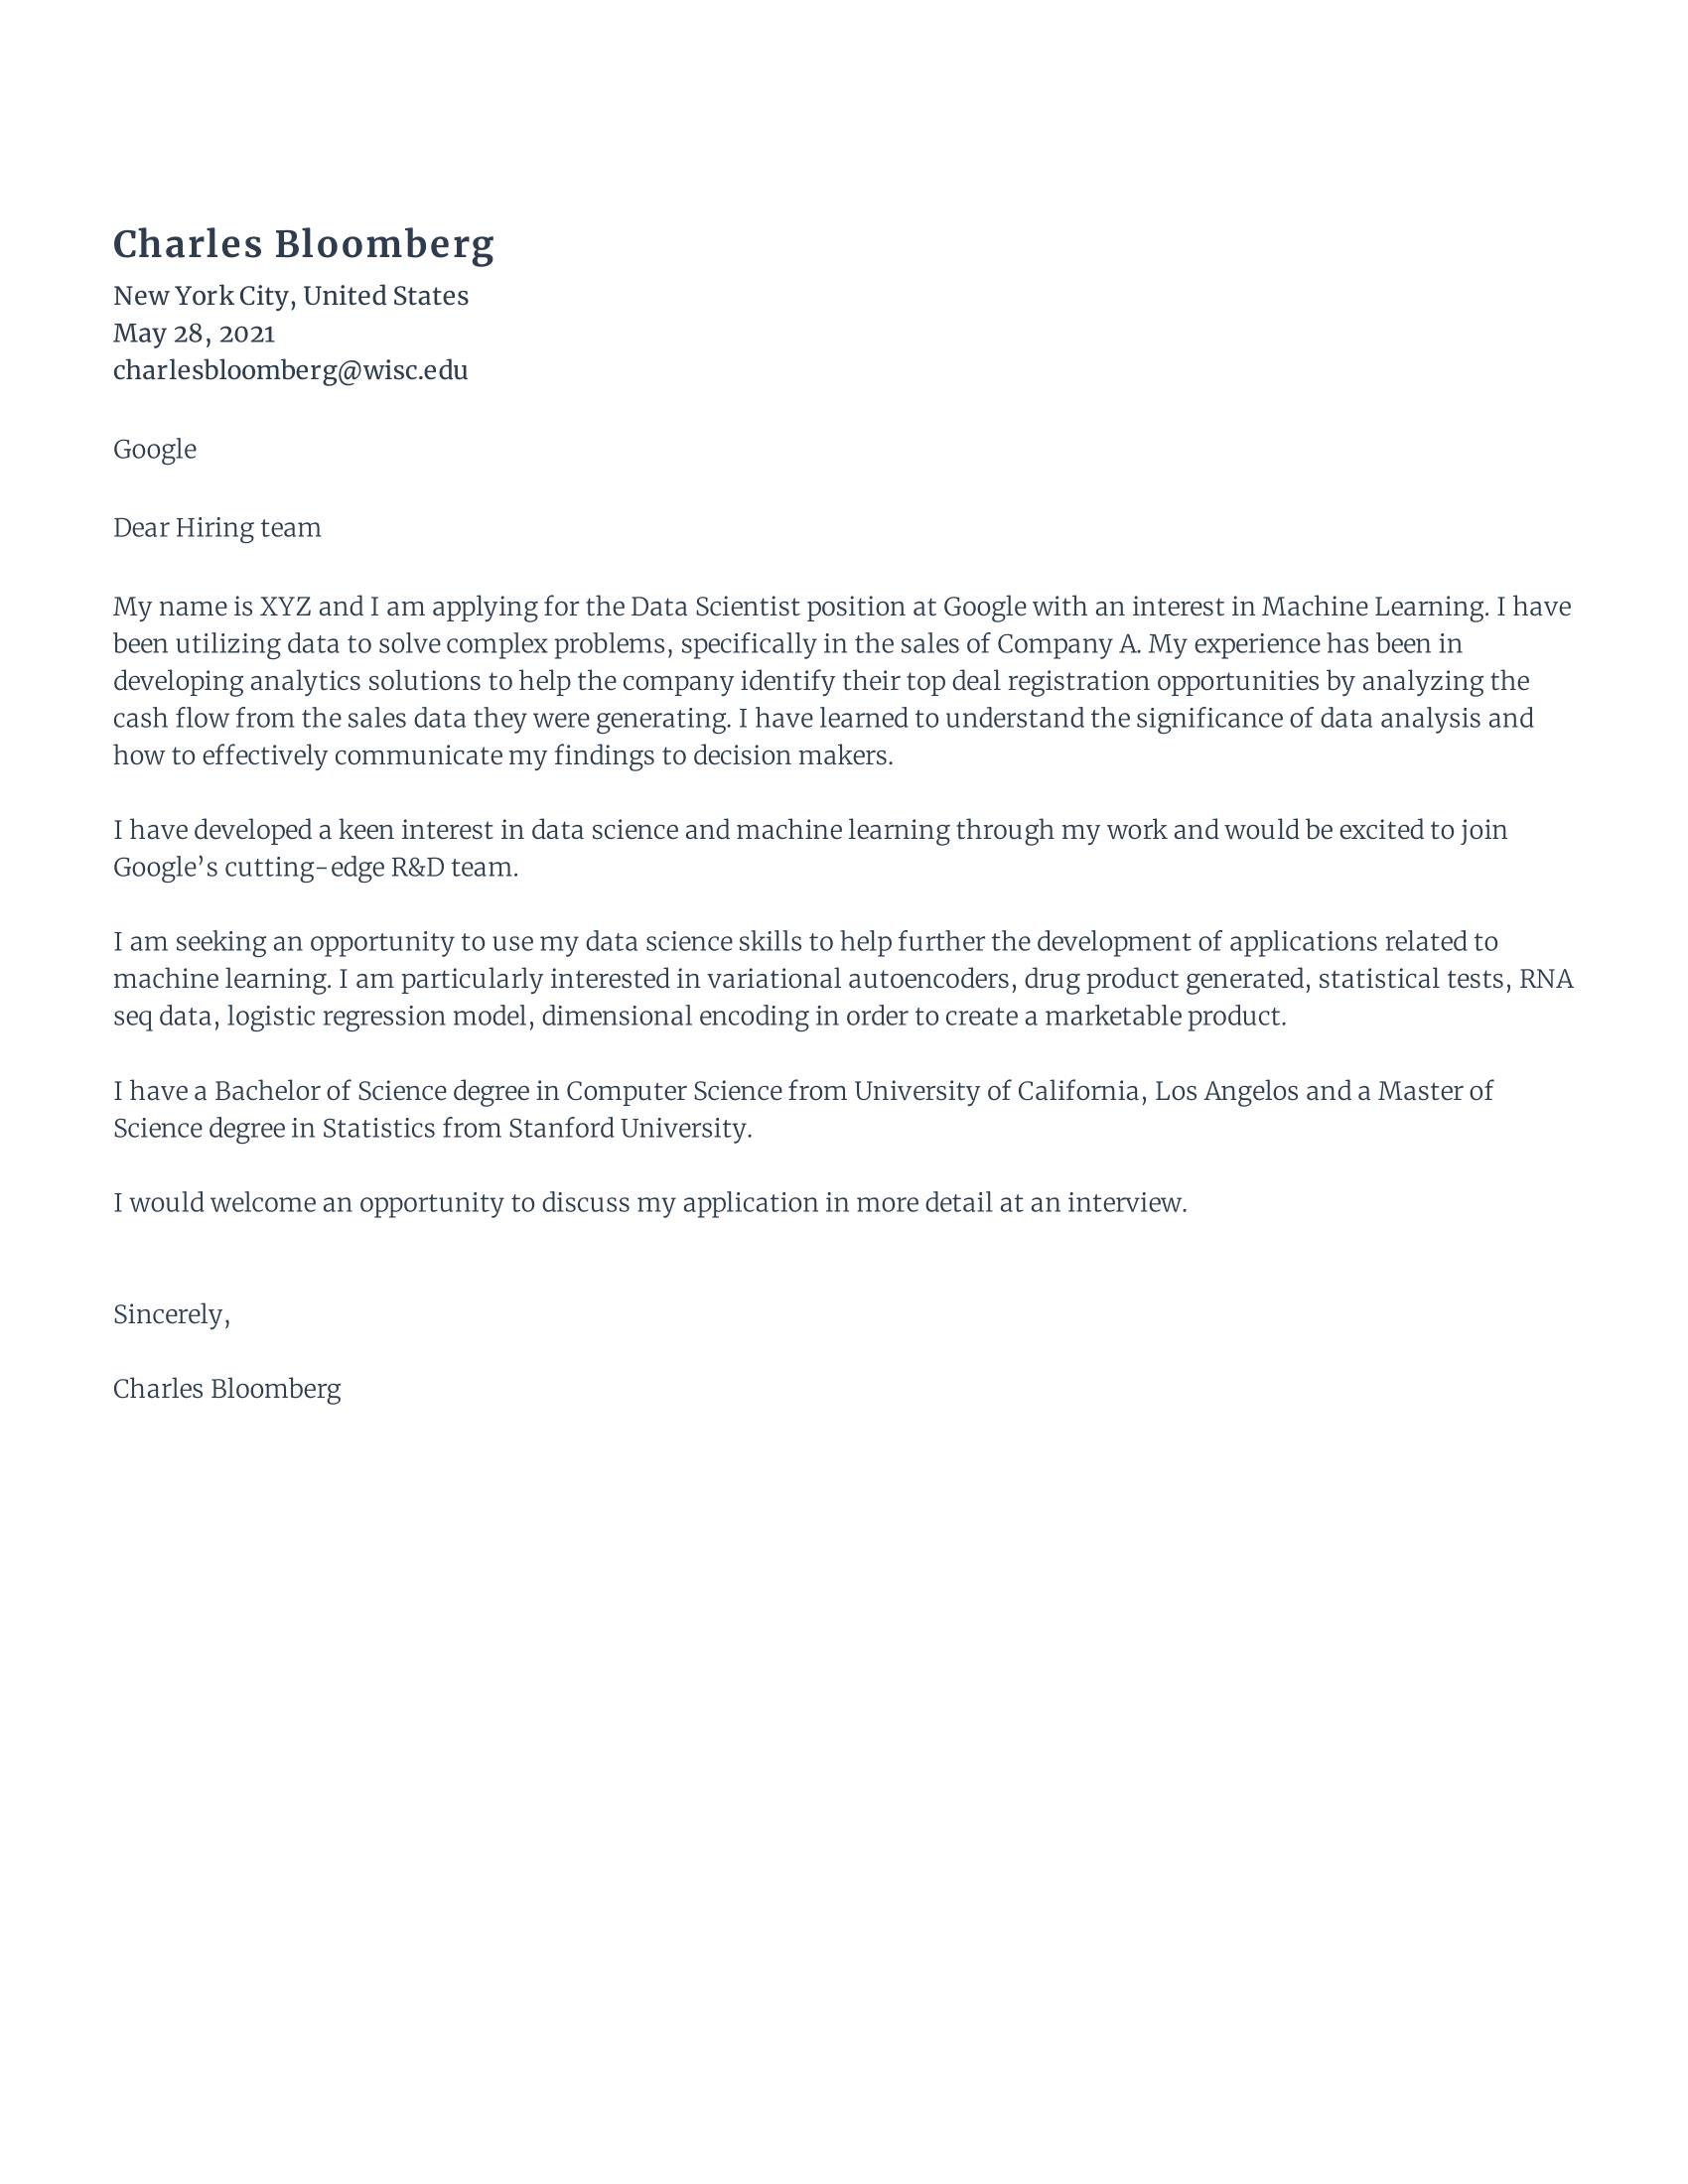 Data Scientist Cover Letter